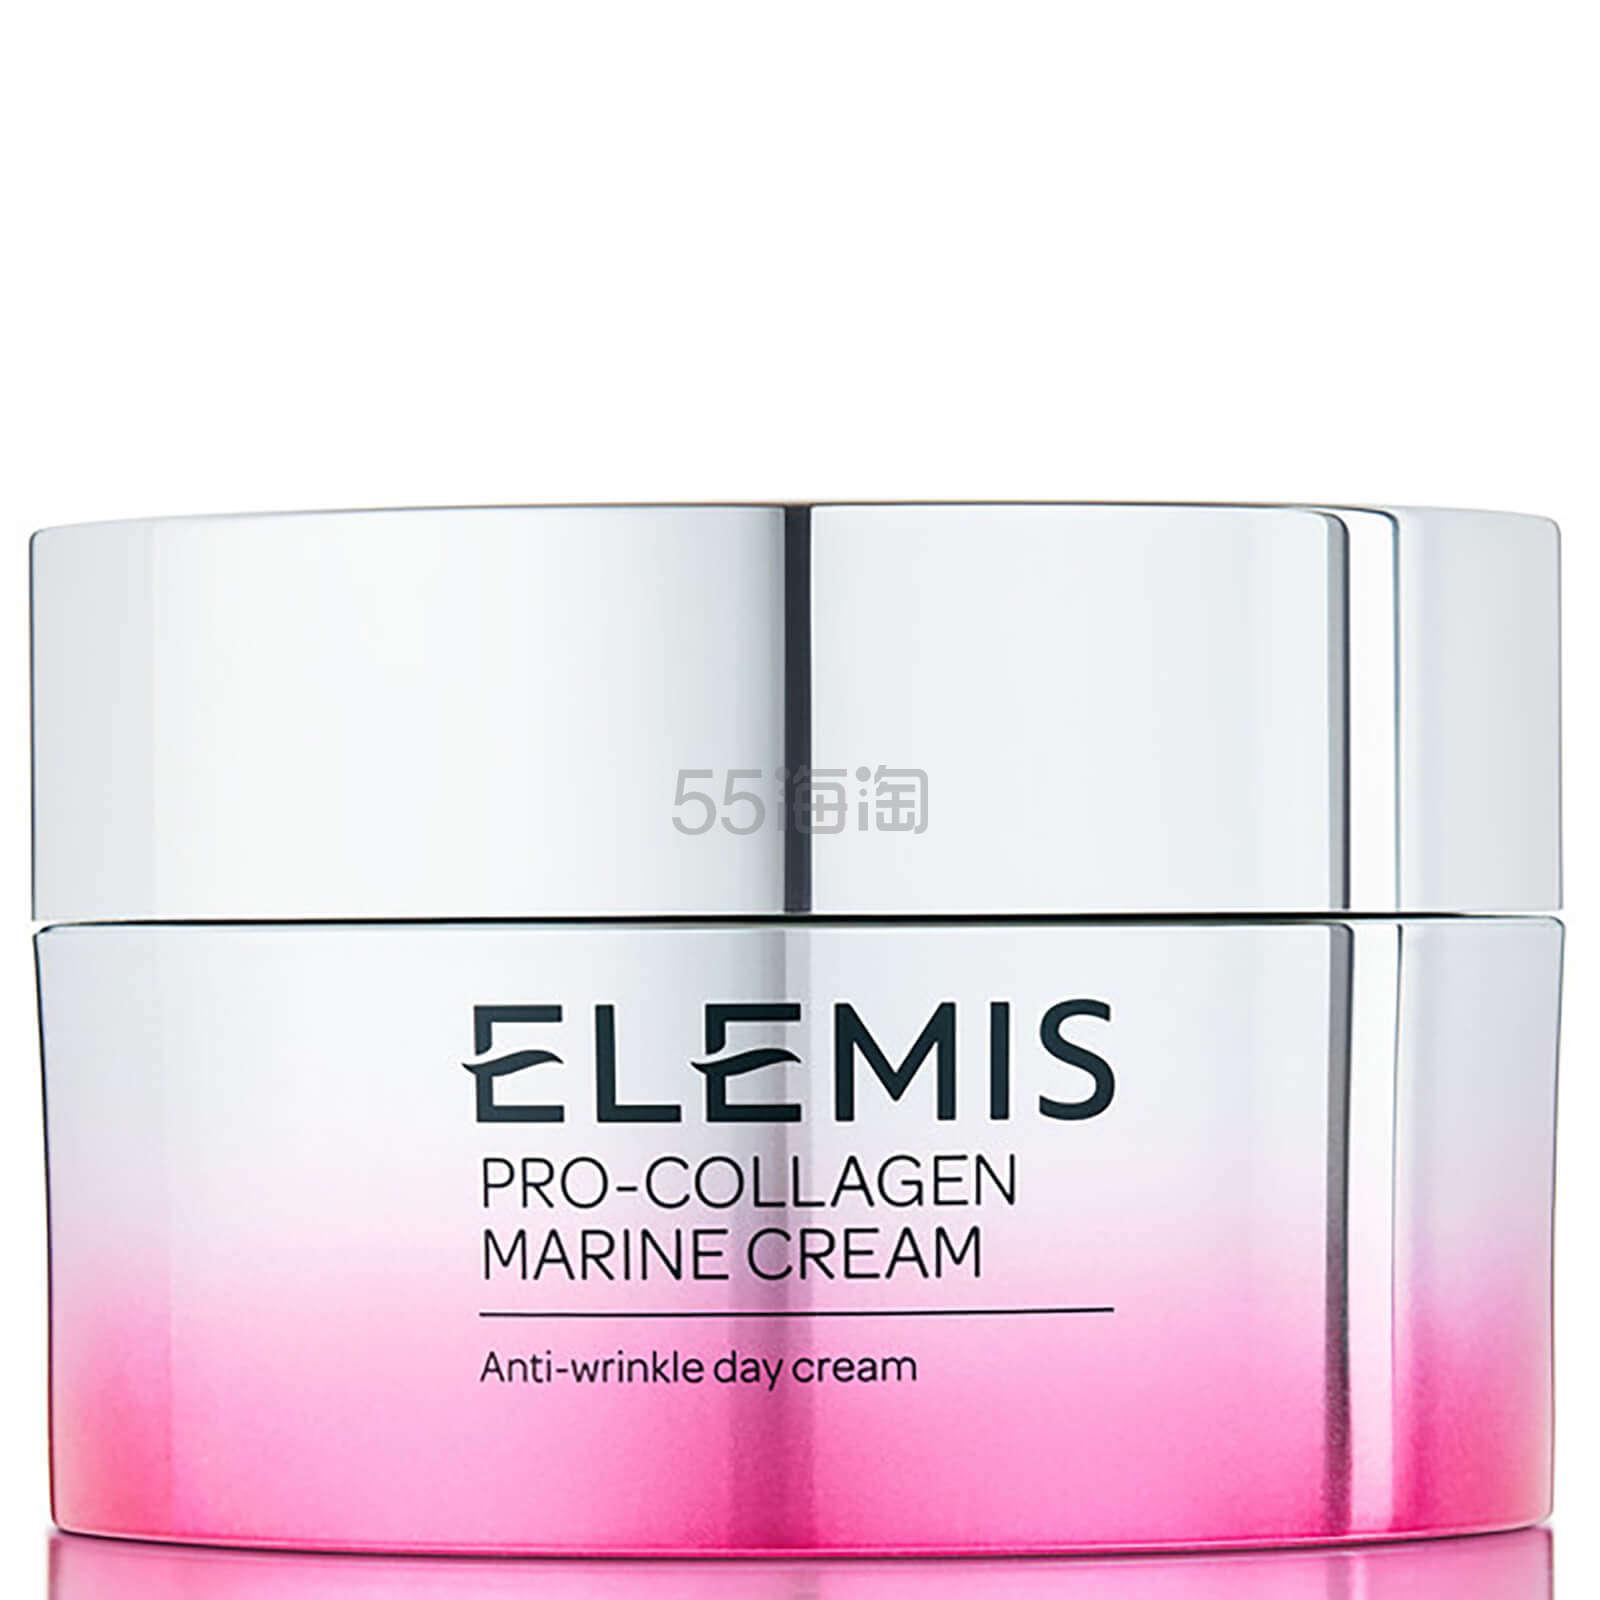 Elemis 艾丽美 海洋骨胶原面霜 加量大瓶装 100ml £88(约761元) - 海淘优惠海淘折扣|55海淘网